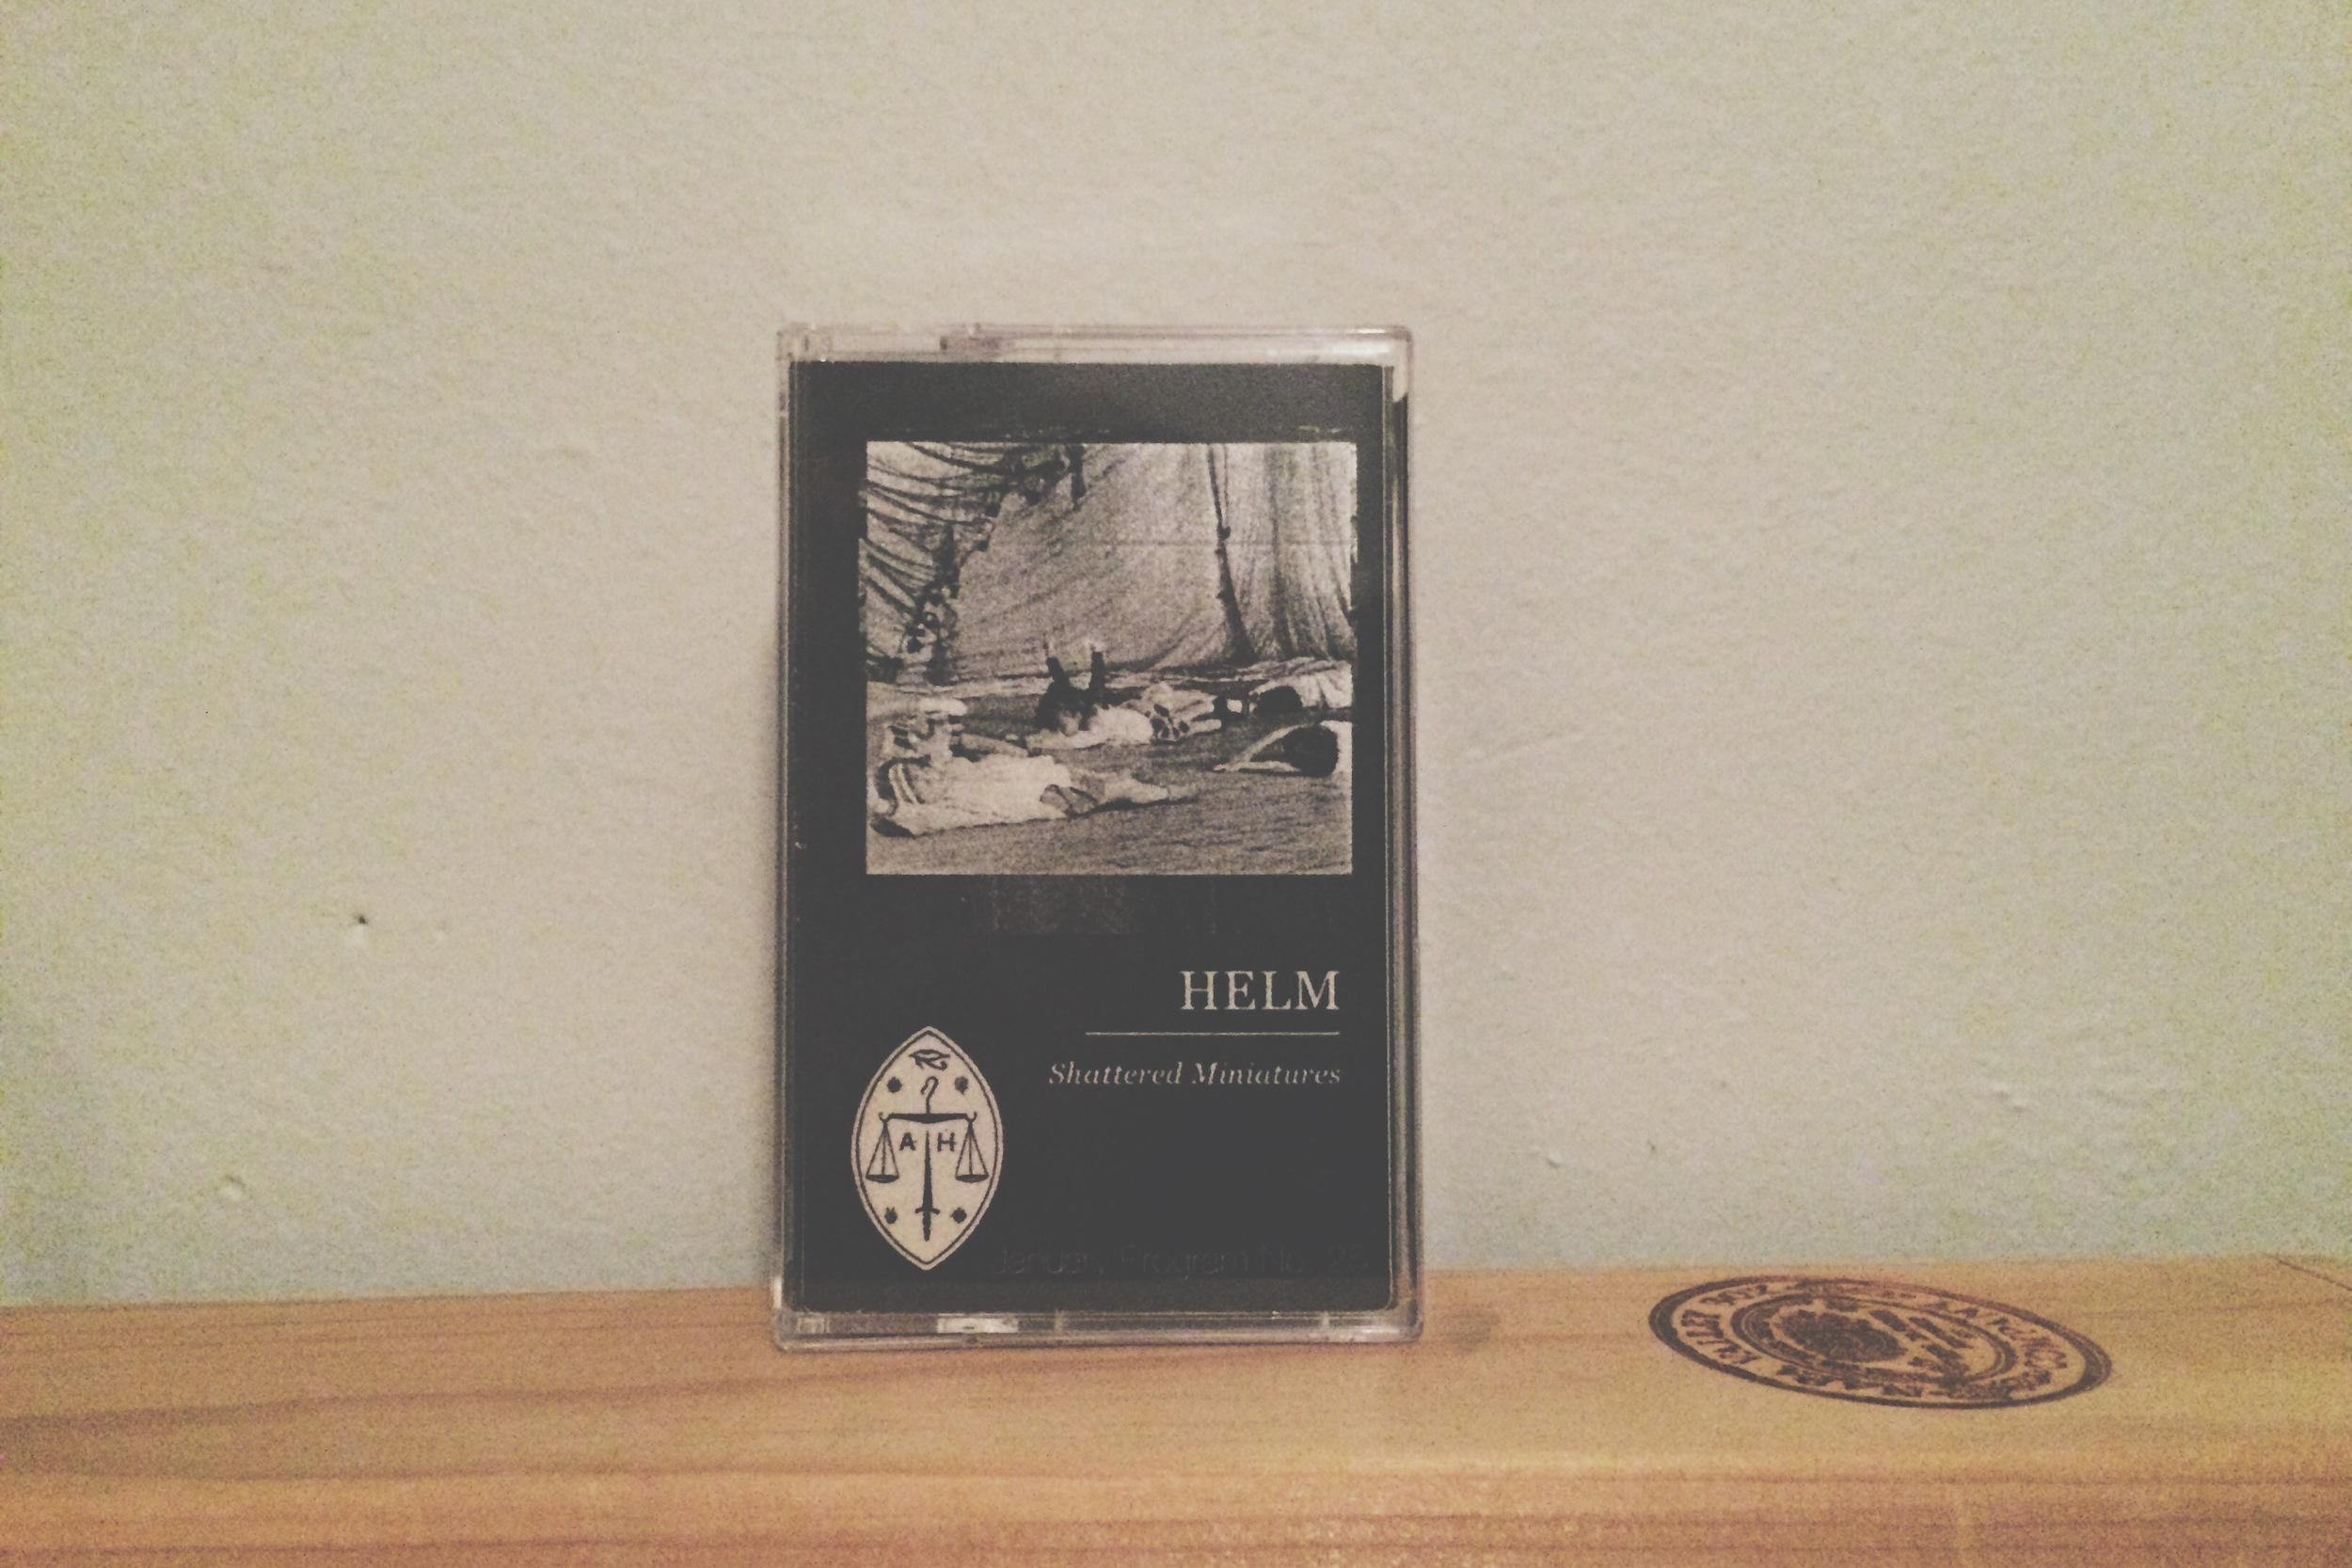 3 08. Helm - Shattered Miniatures.jpg